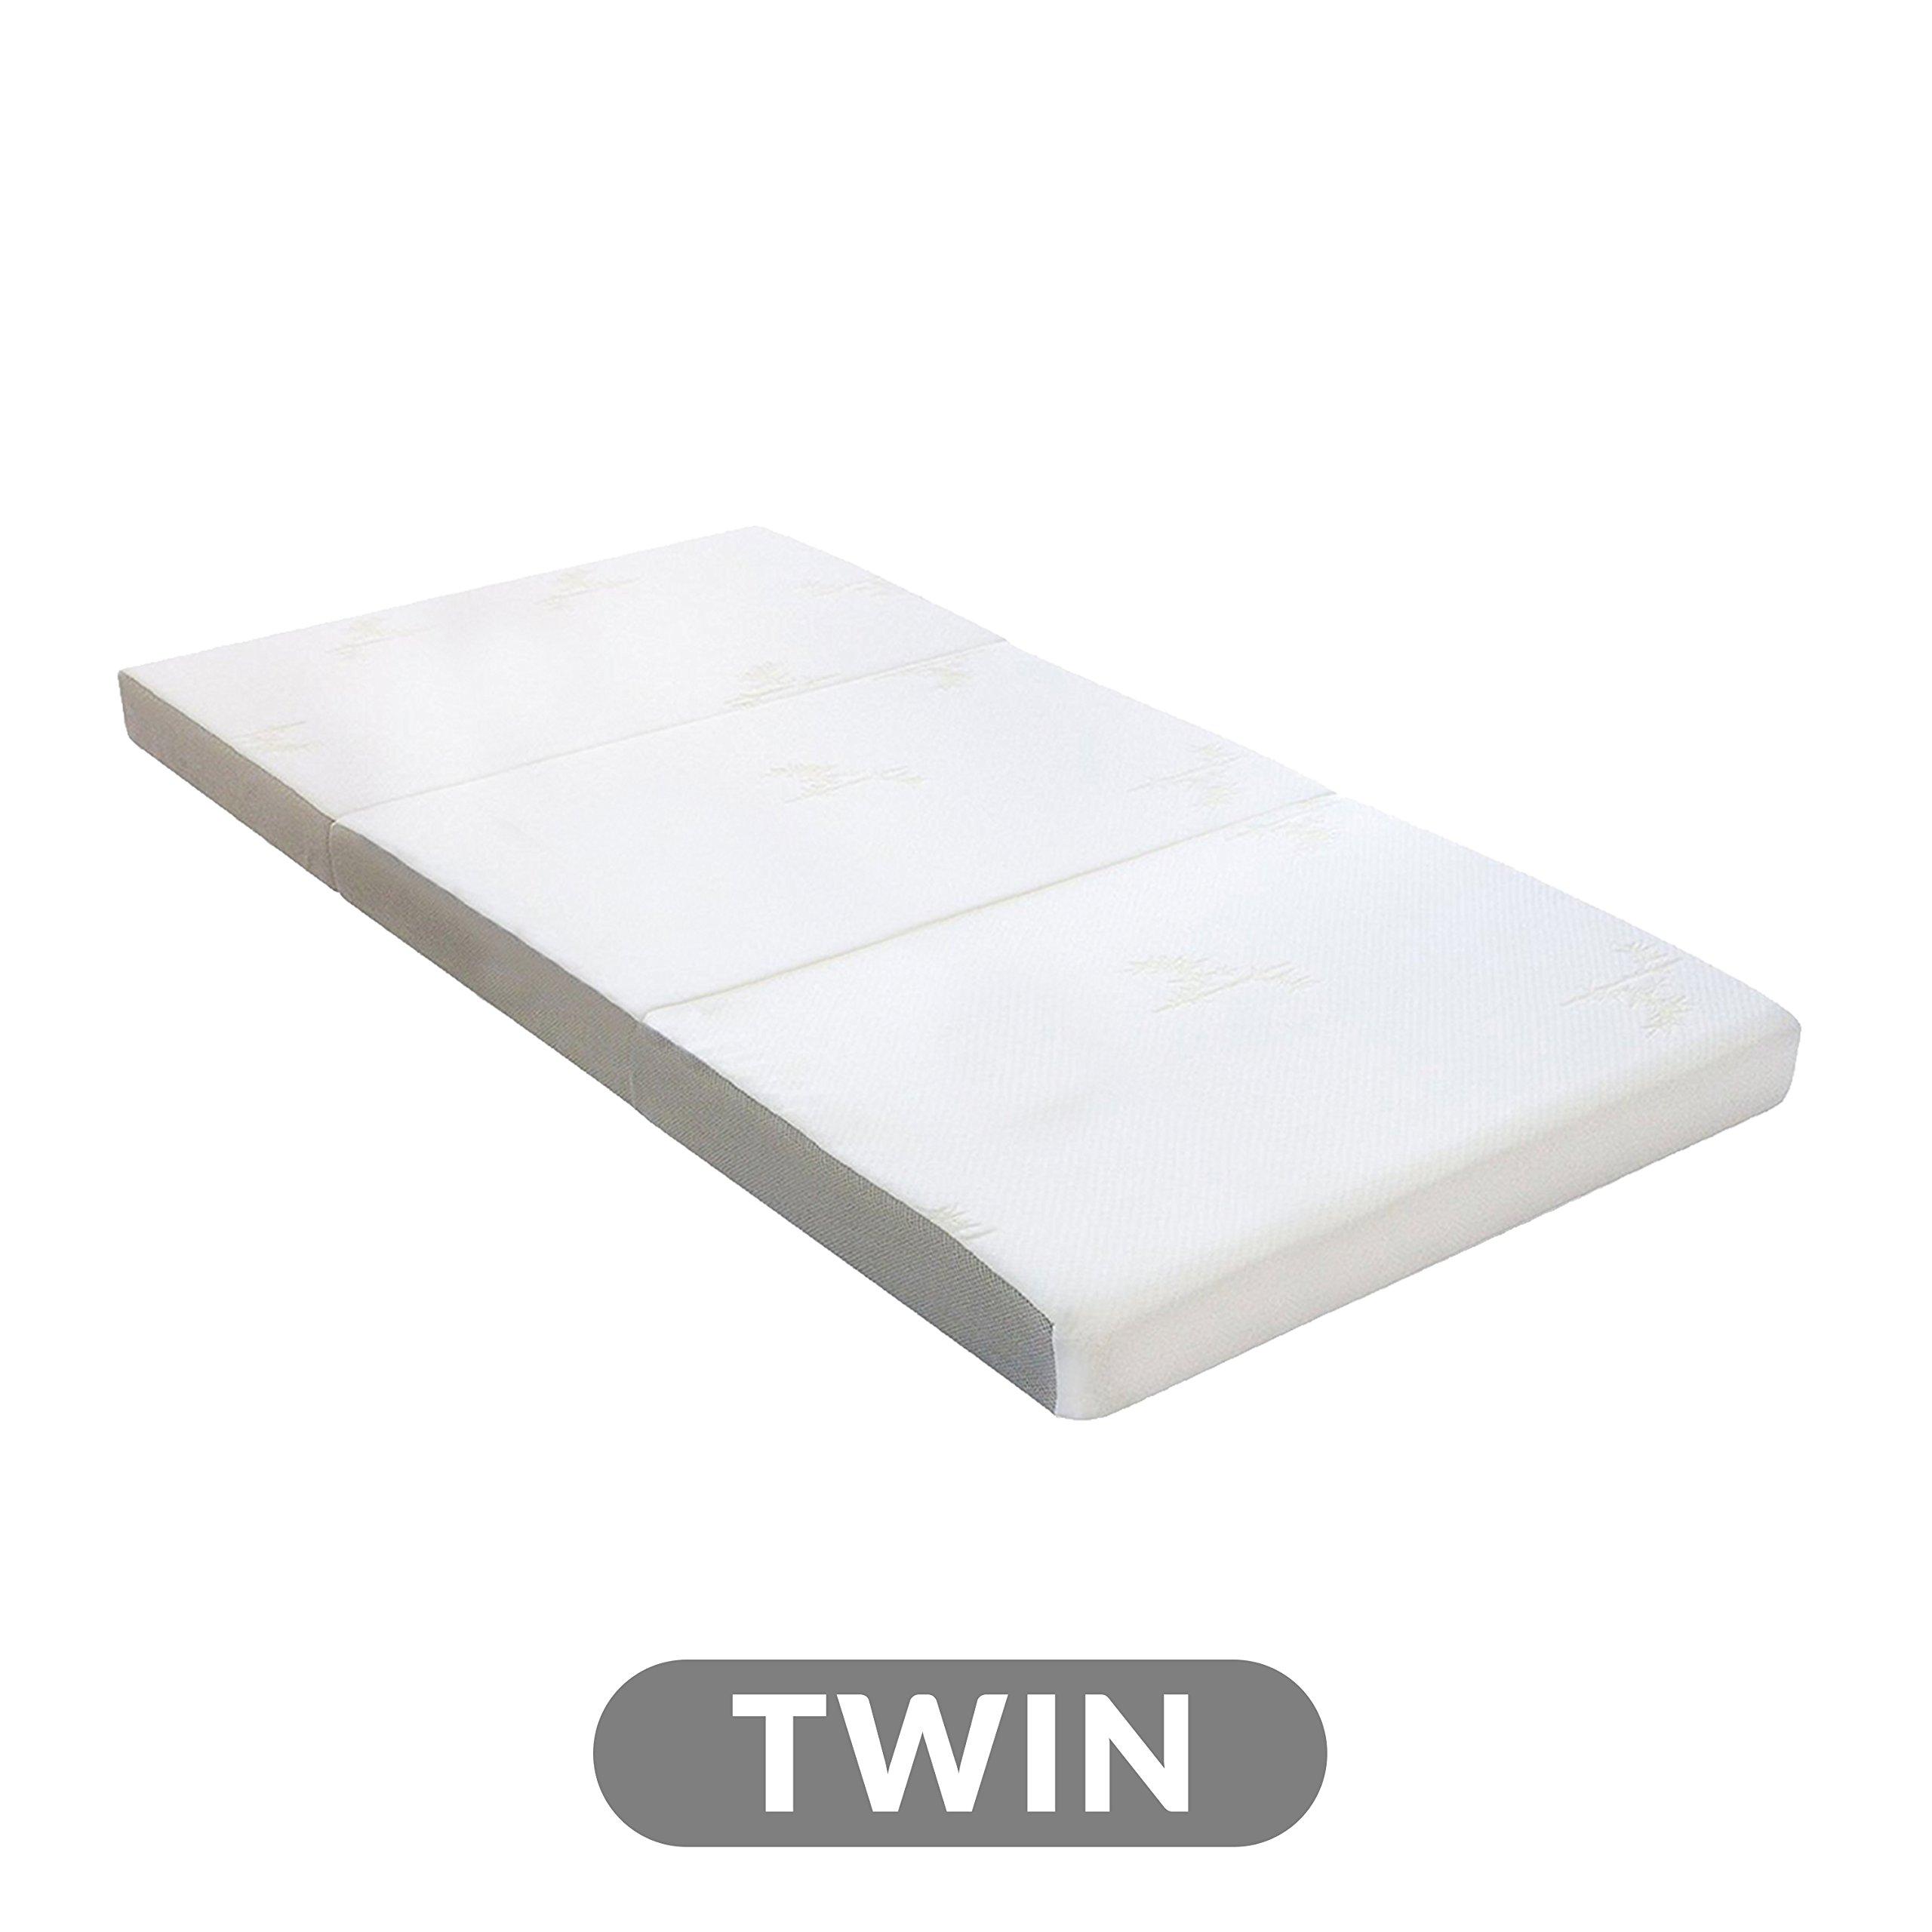 Milliard Tri Folding Mattress with Washable Cover, Twin (75 inches x 38 inches x 4 inches) by Milliard